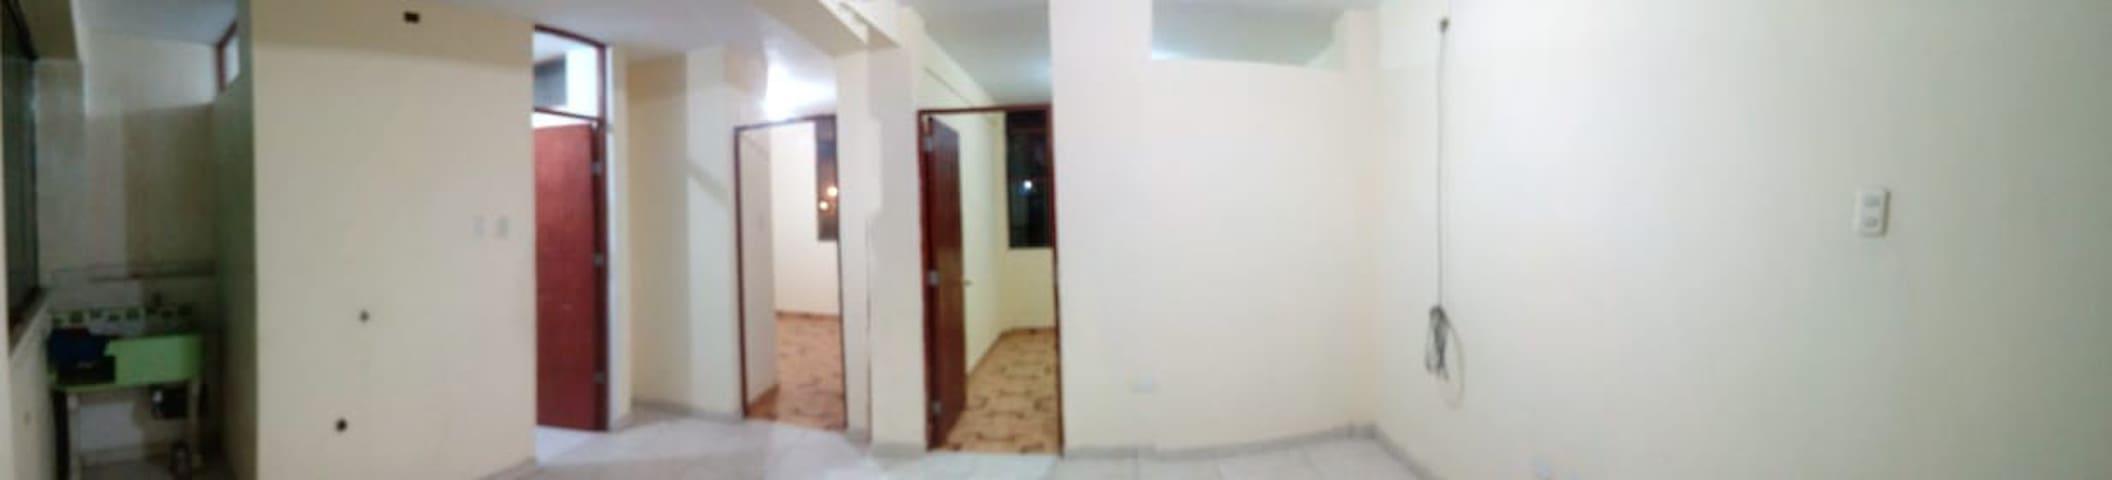 Mini Departamento Tupac Amaru Km17 Carabayllo Lima